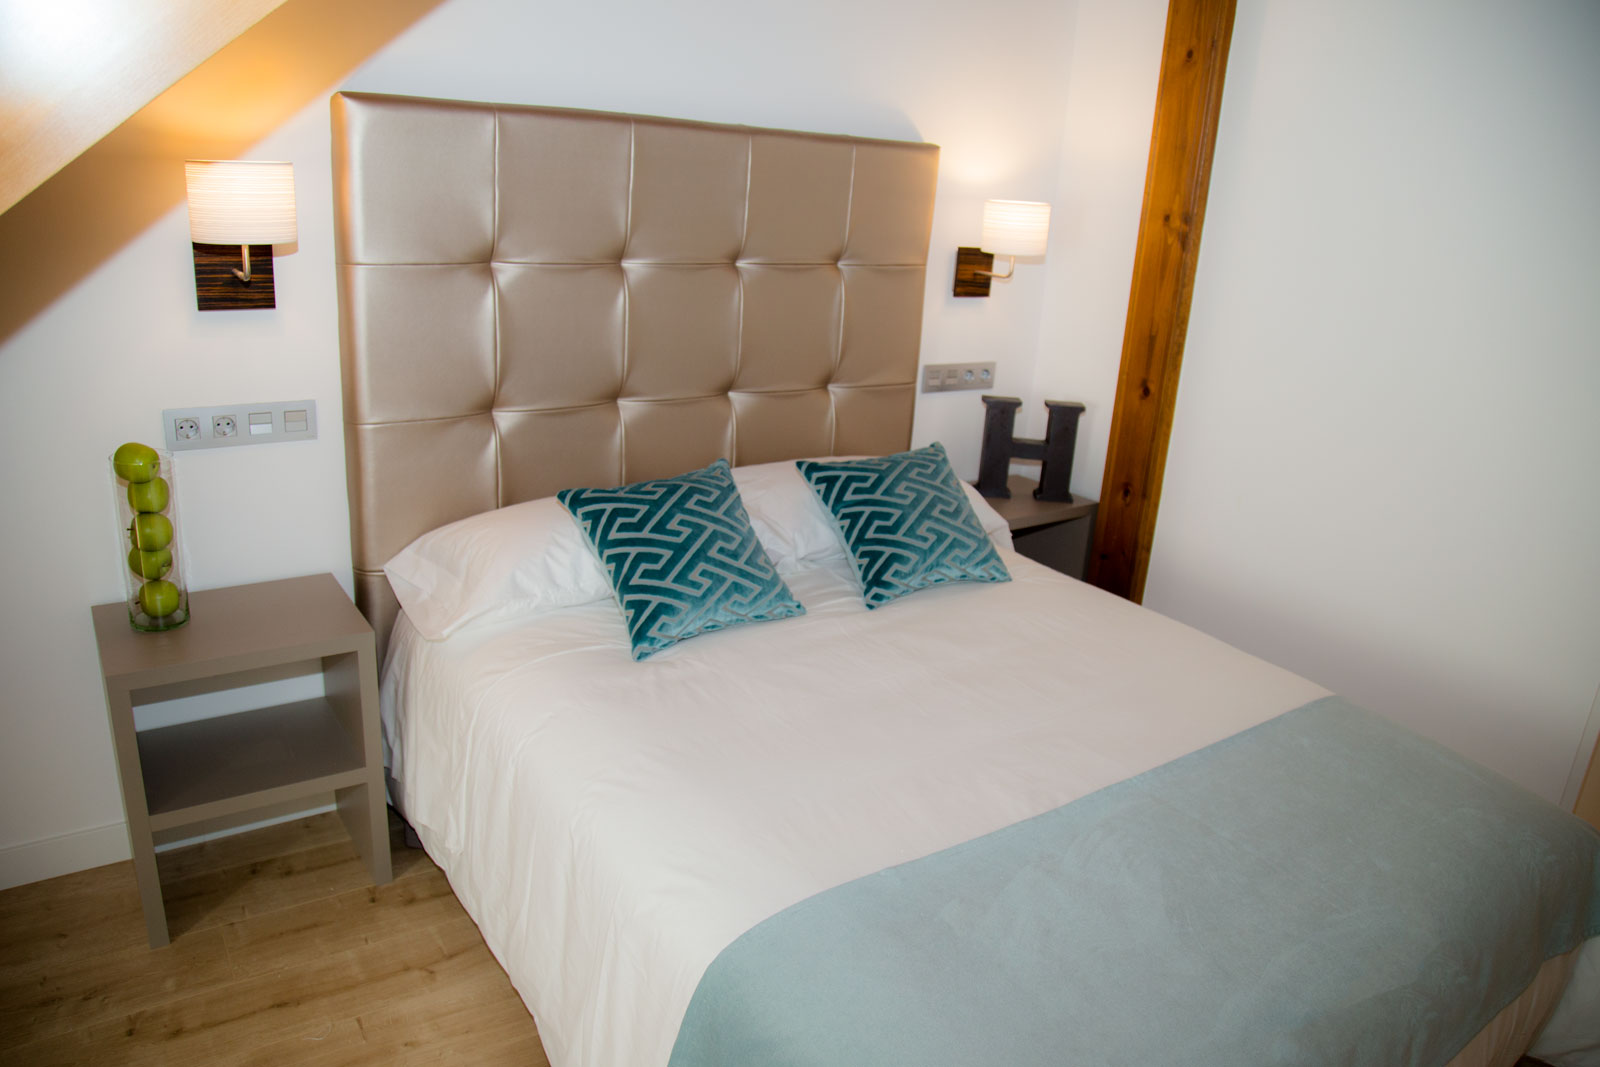 habitaci n familiar con cama supletoria h b urban hostel